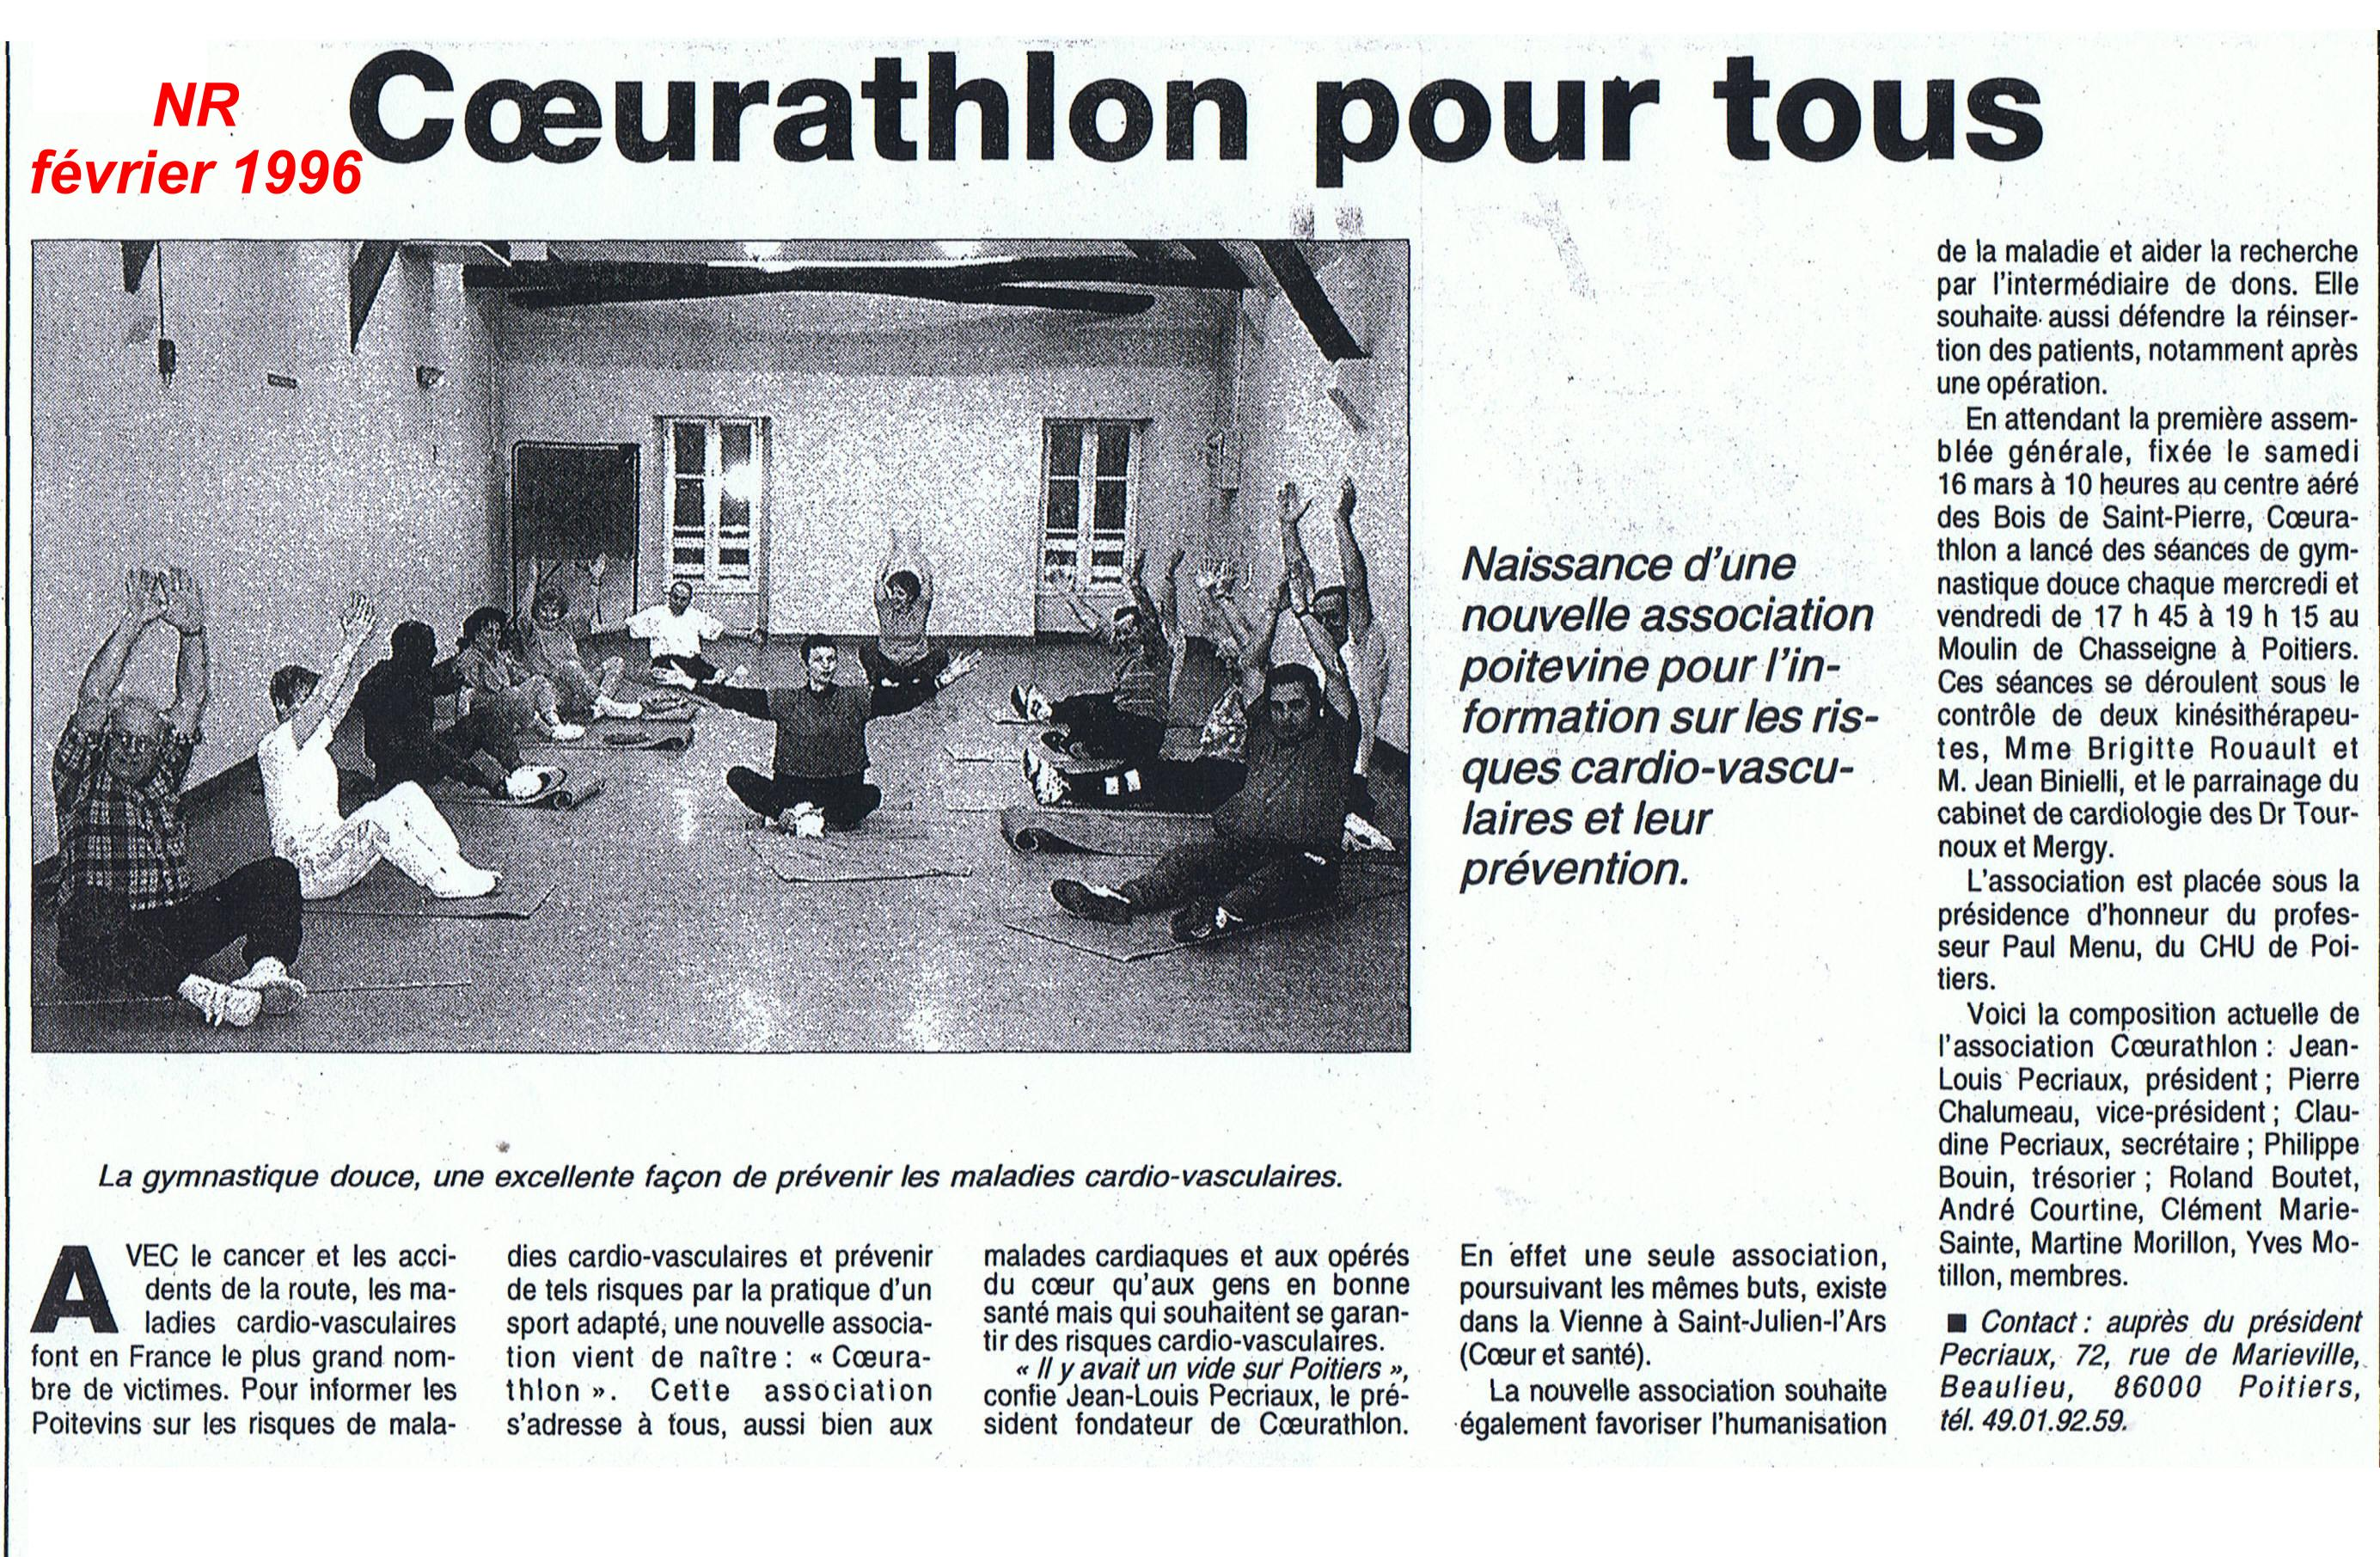 1996_02_nr_coeurathlon-pour-tous